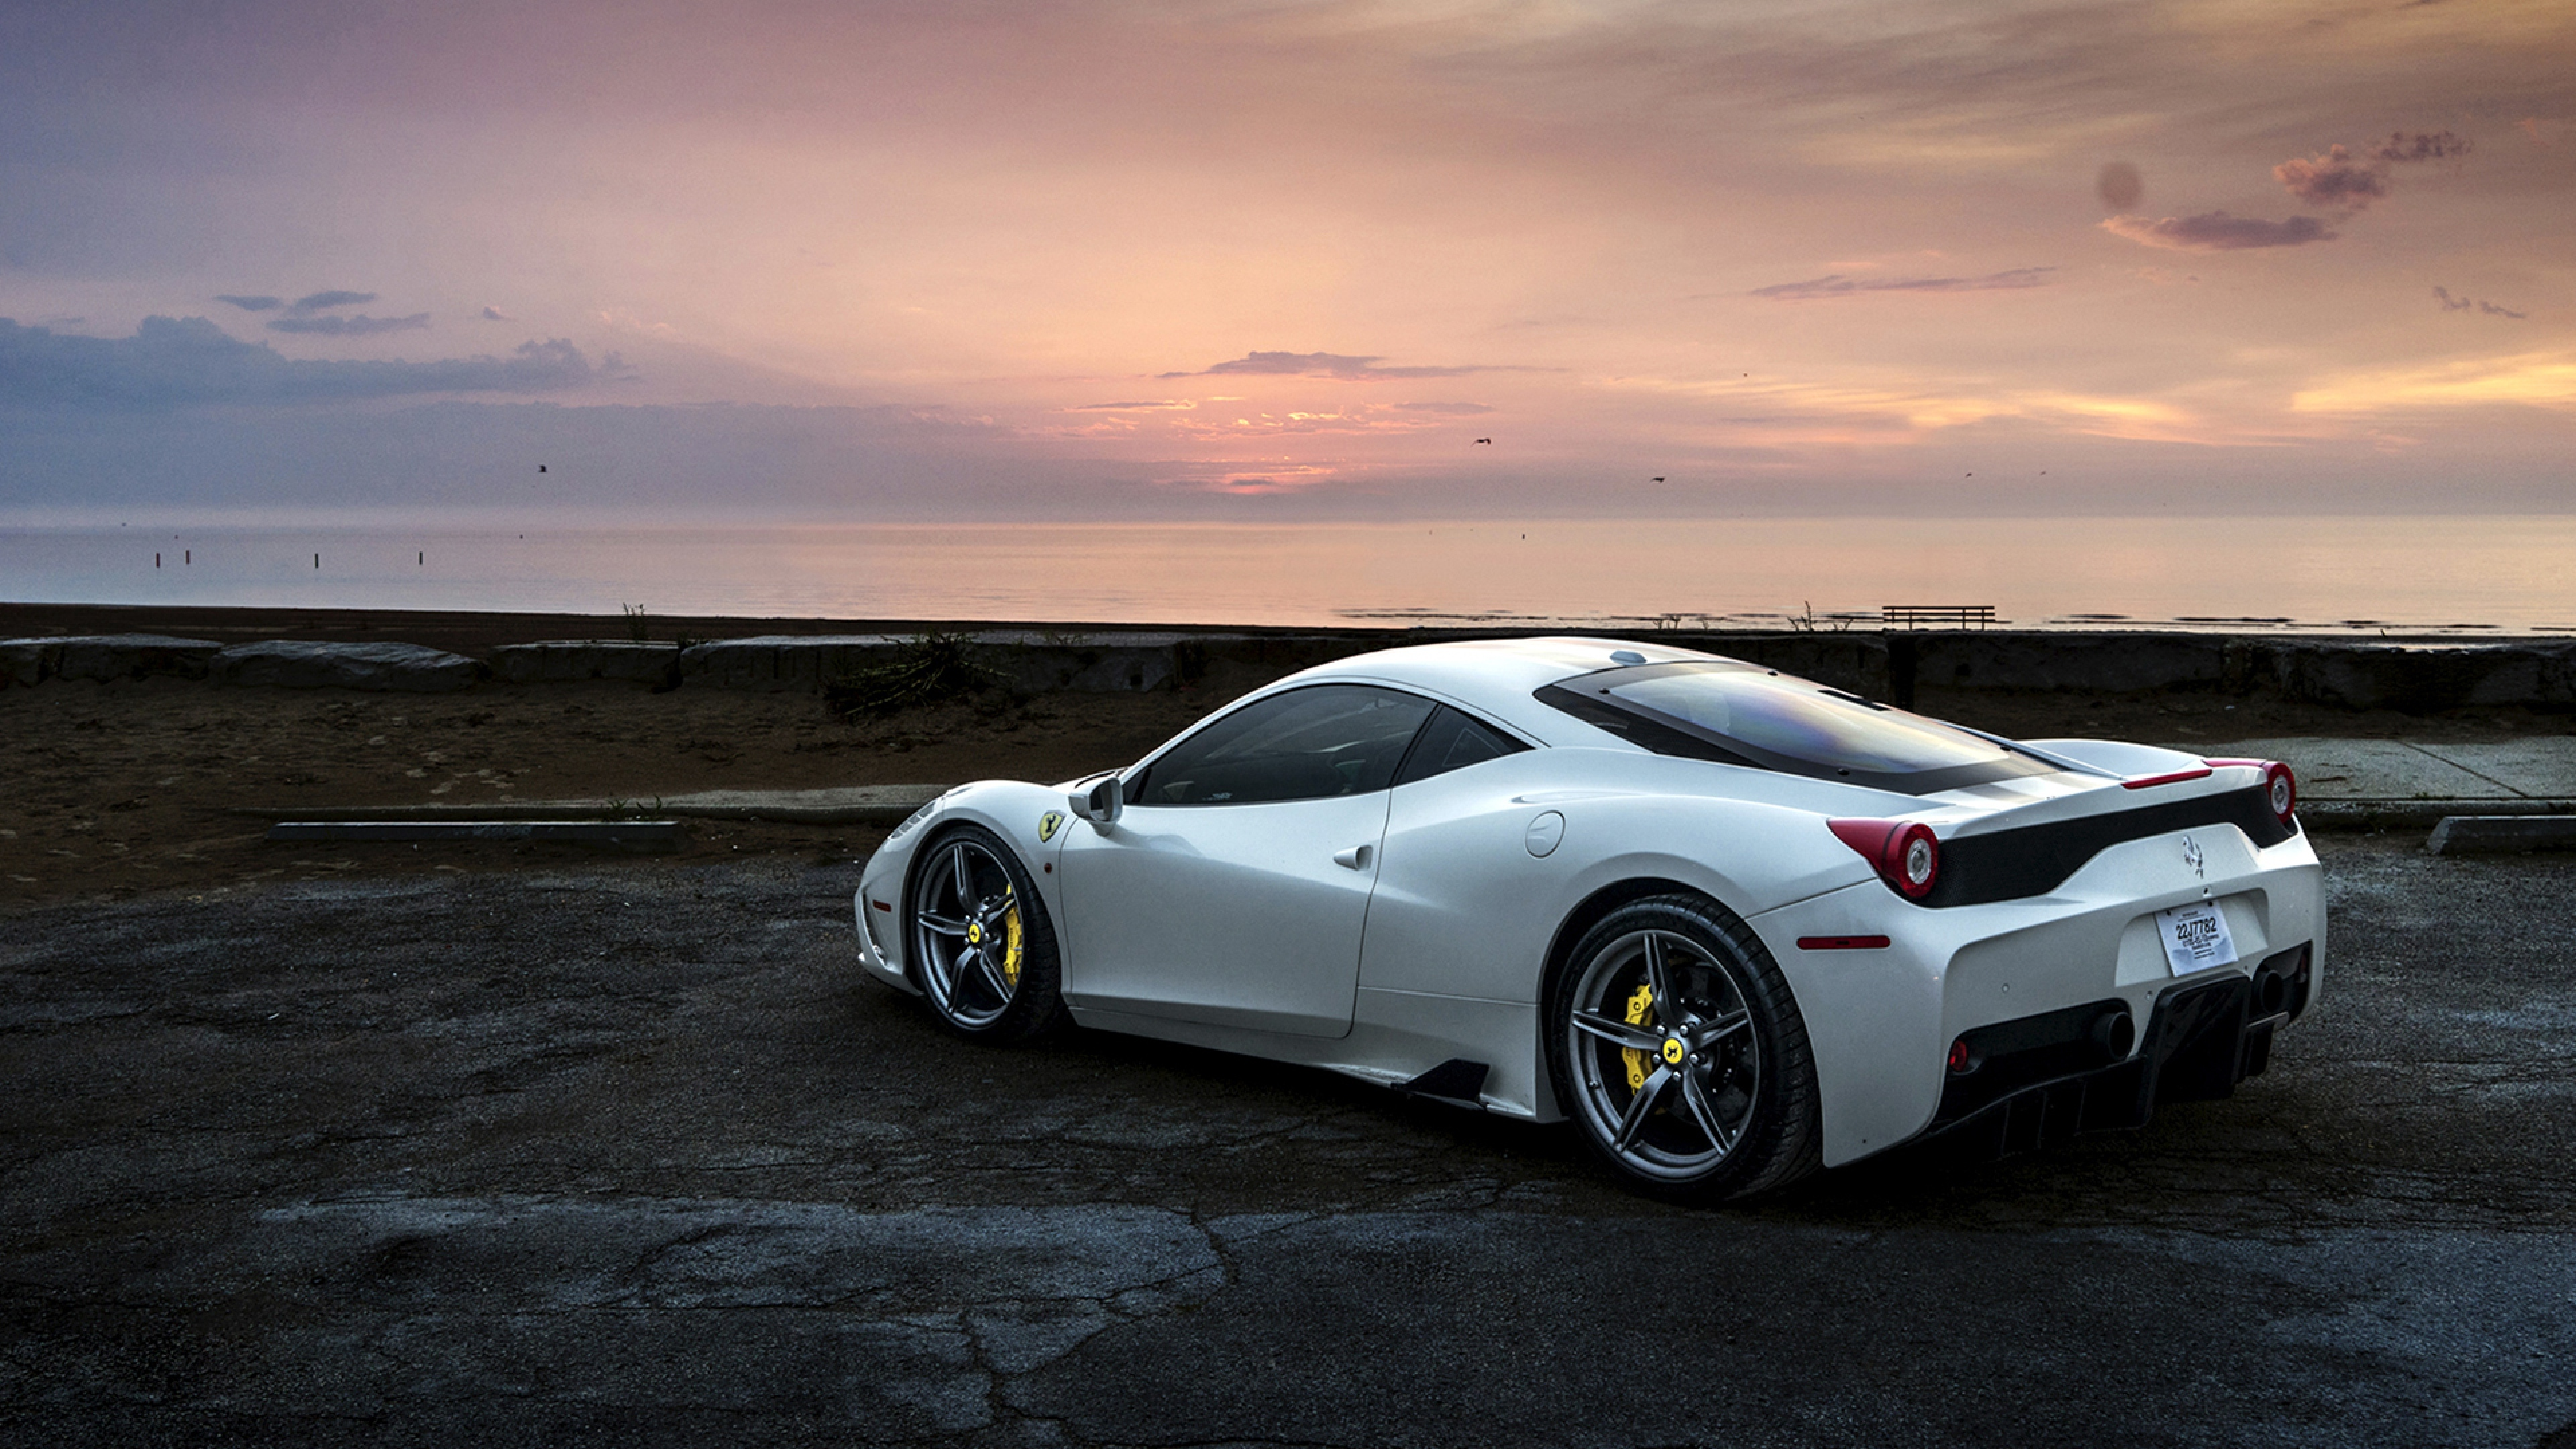 2560x1600 Ferrari 458 White 2560x1600 Resolution HD 4k Wallpapers ...